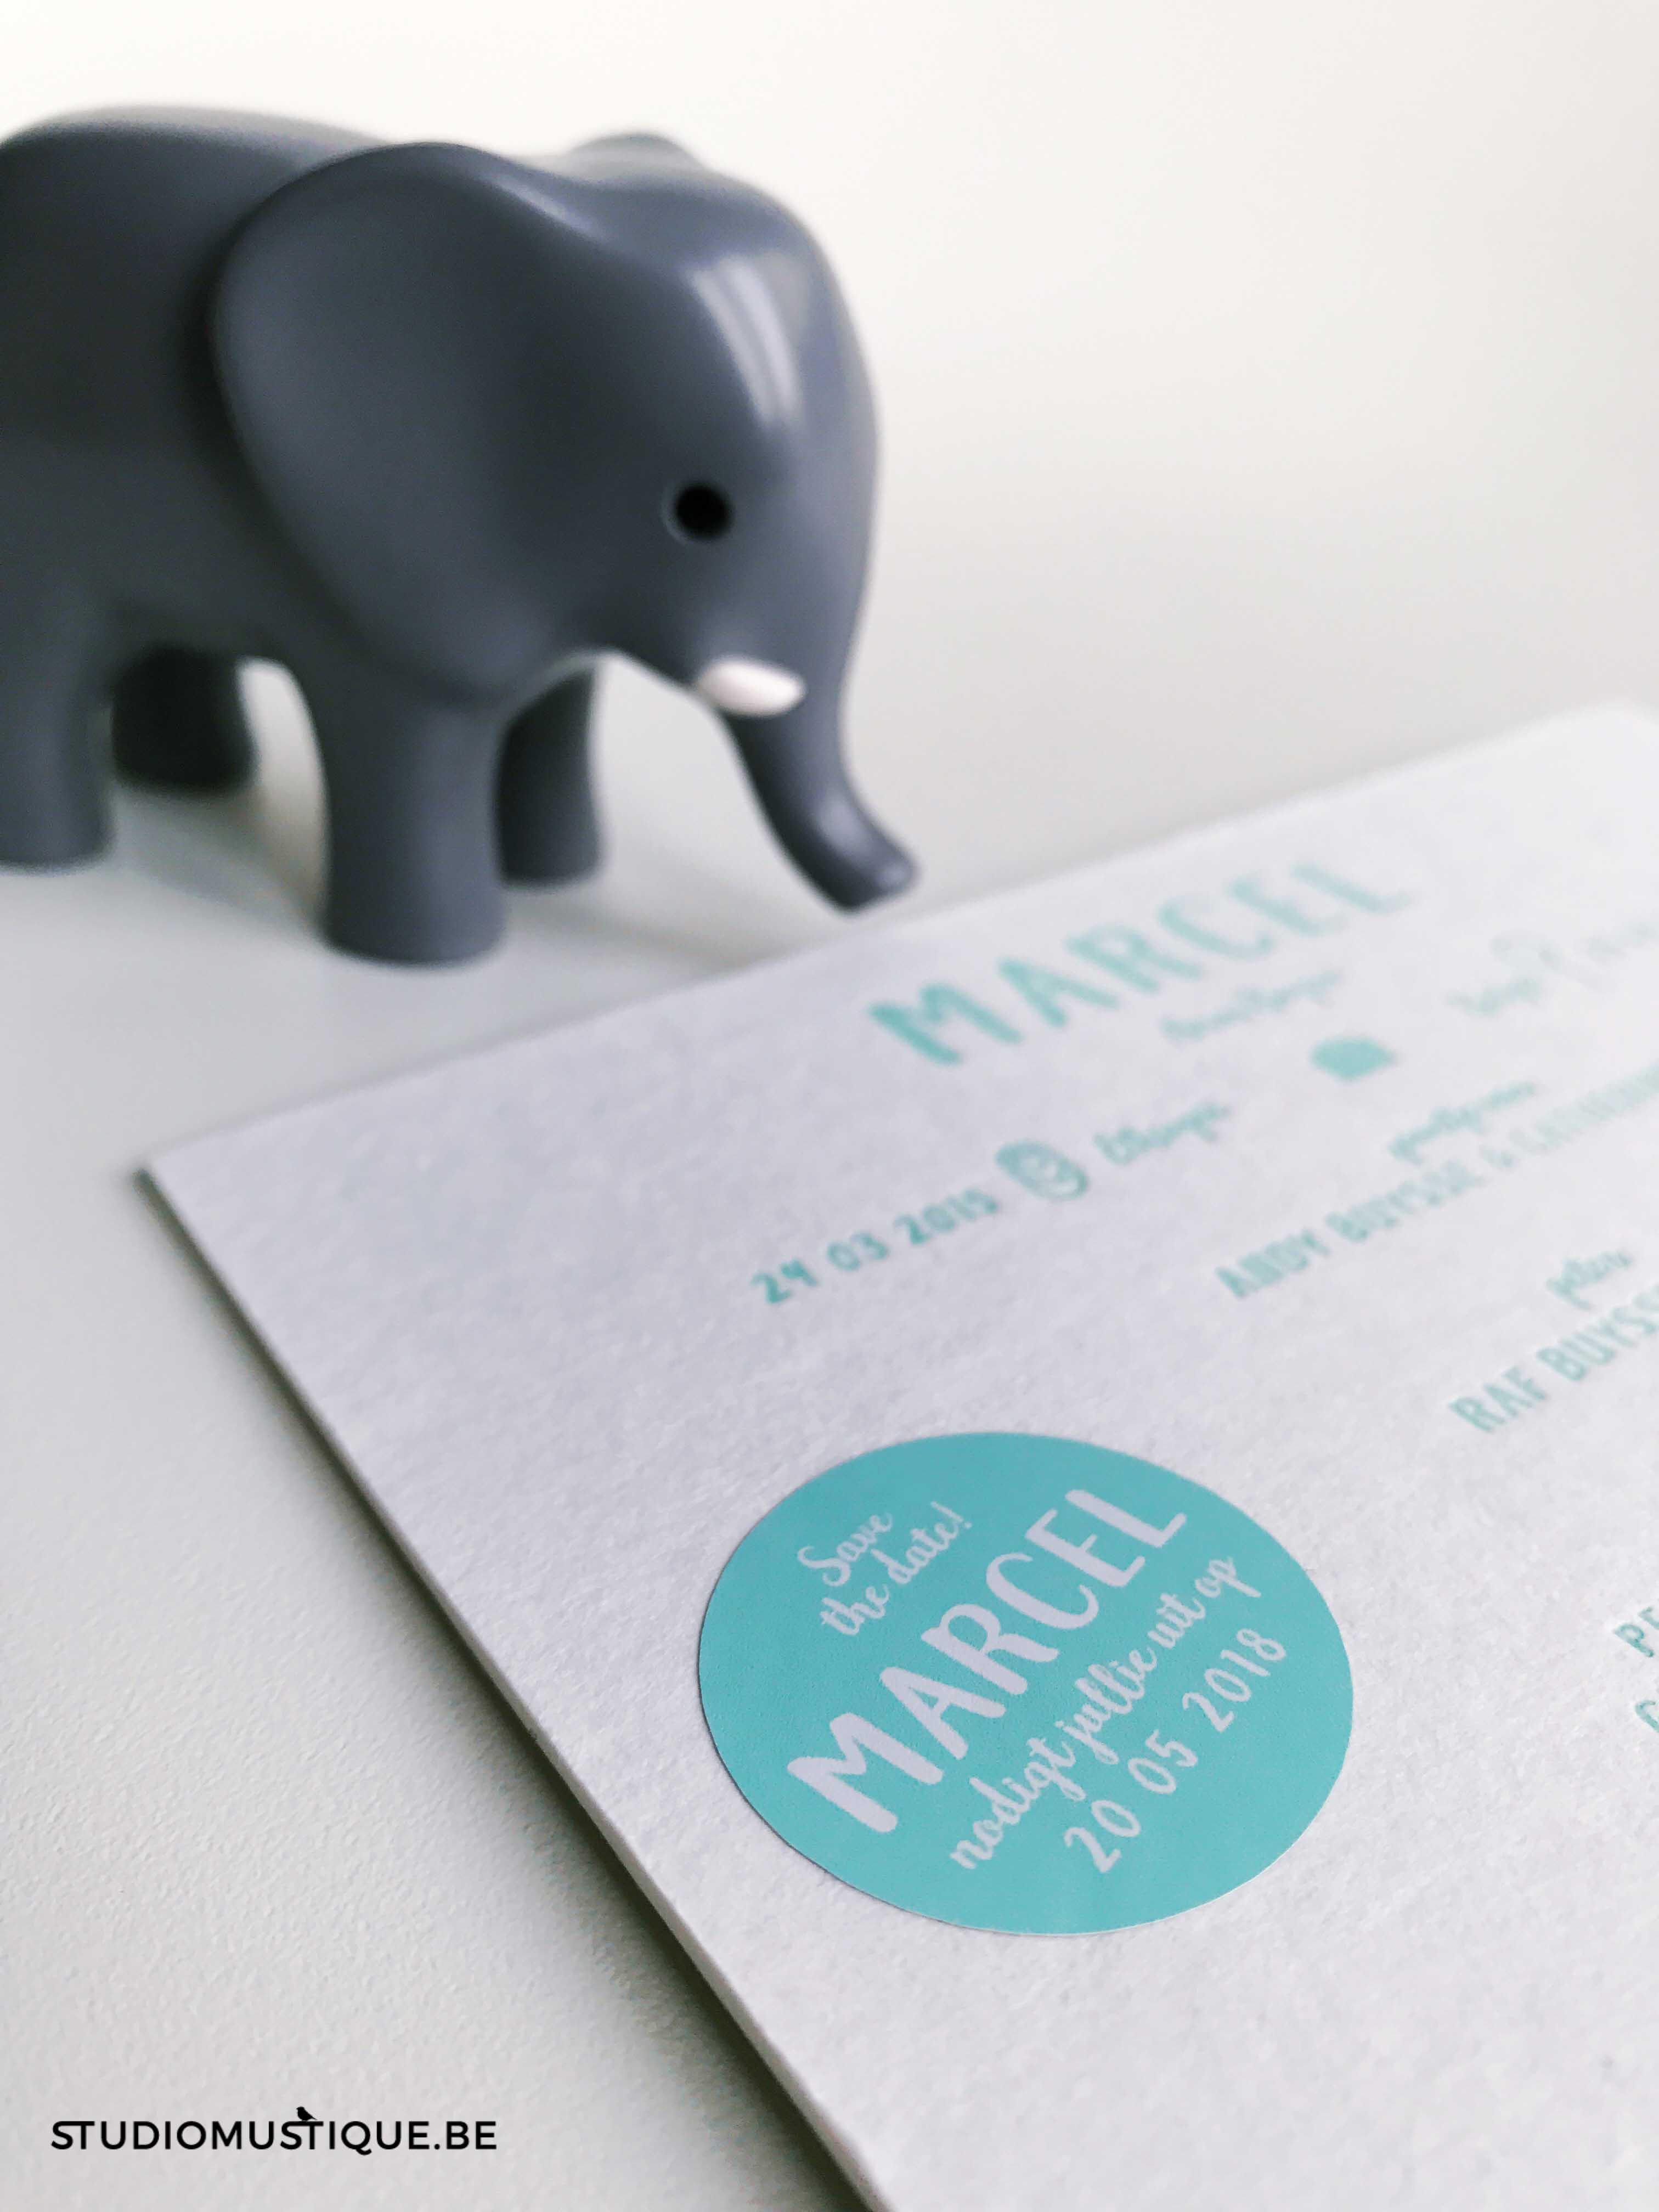 Studio Mustique Adoptiekaartje Marcel koffertje adoptie olifant giraf zebra valies letterpress munt save the date babyborrel sticker